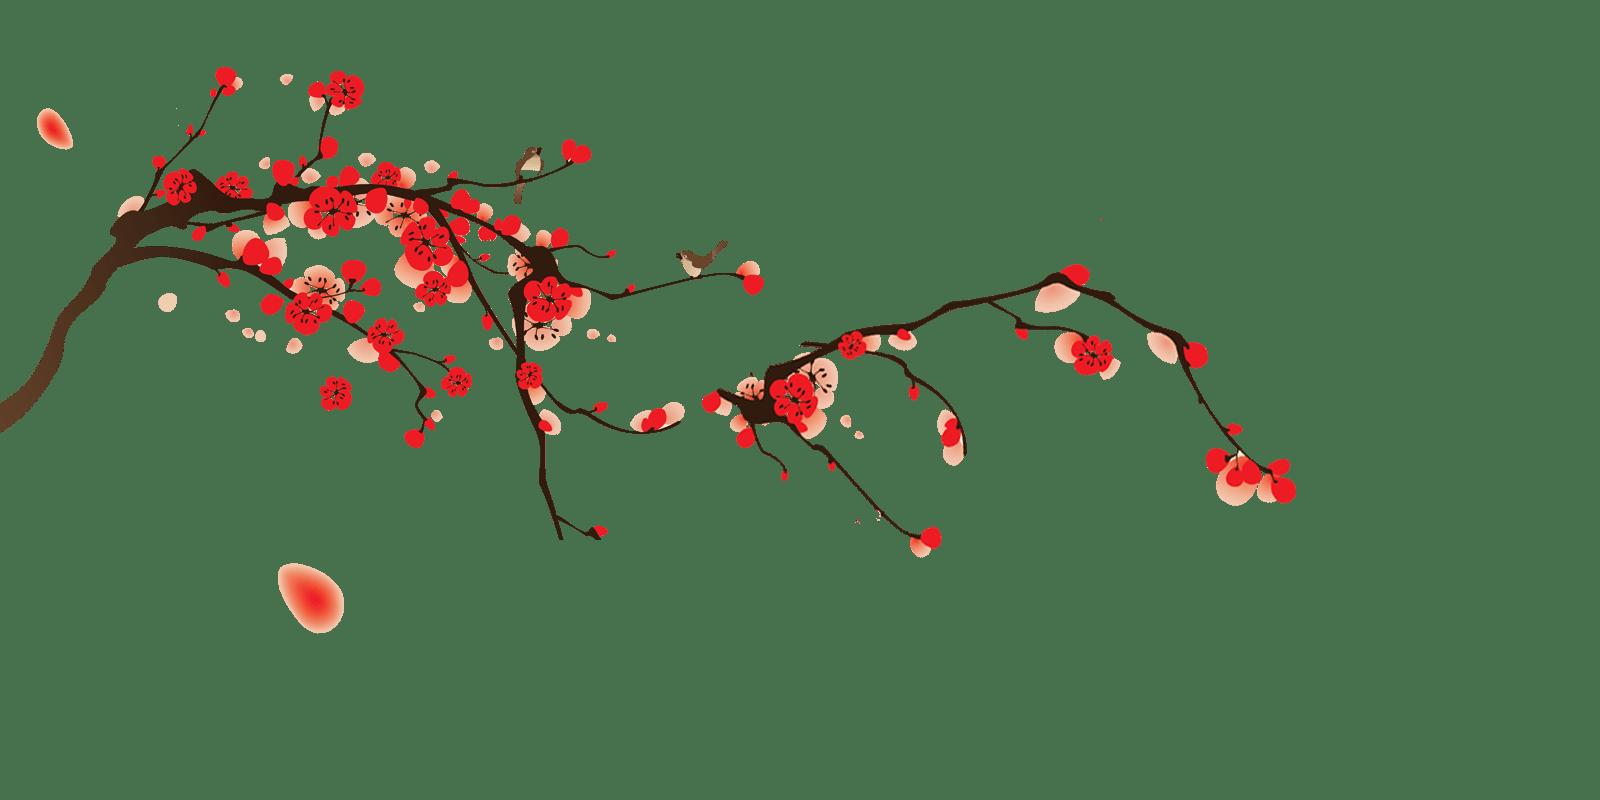 Rose Petals Falling Wallpaper Transparent Gif きまぐれ